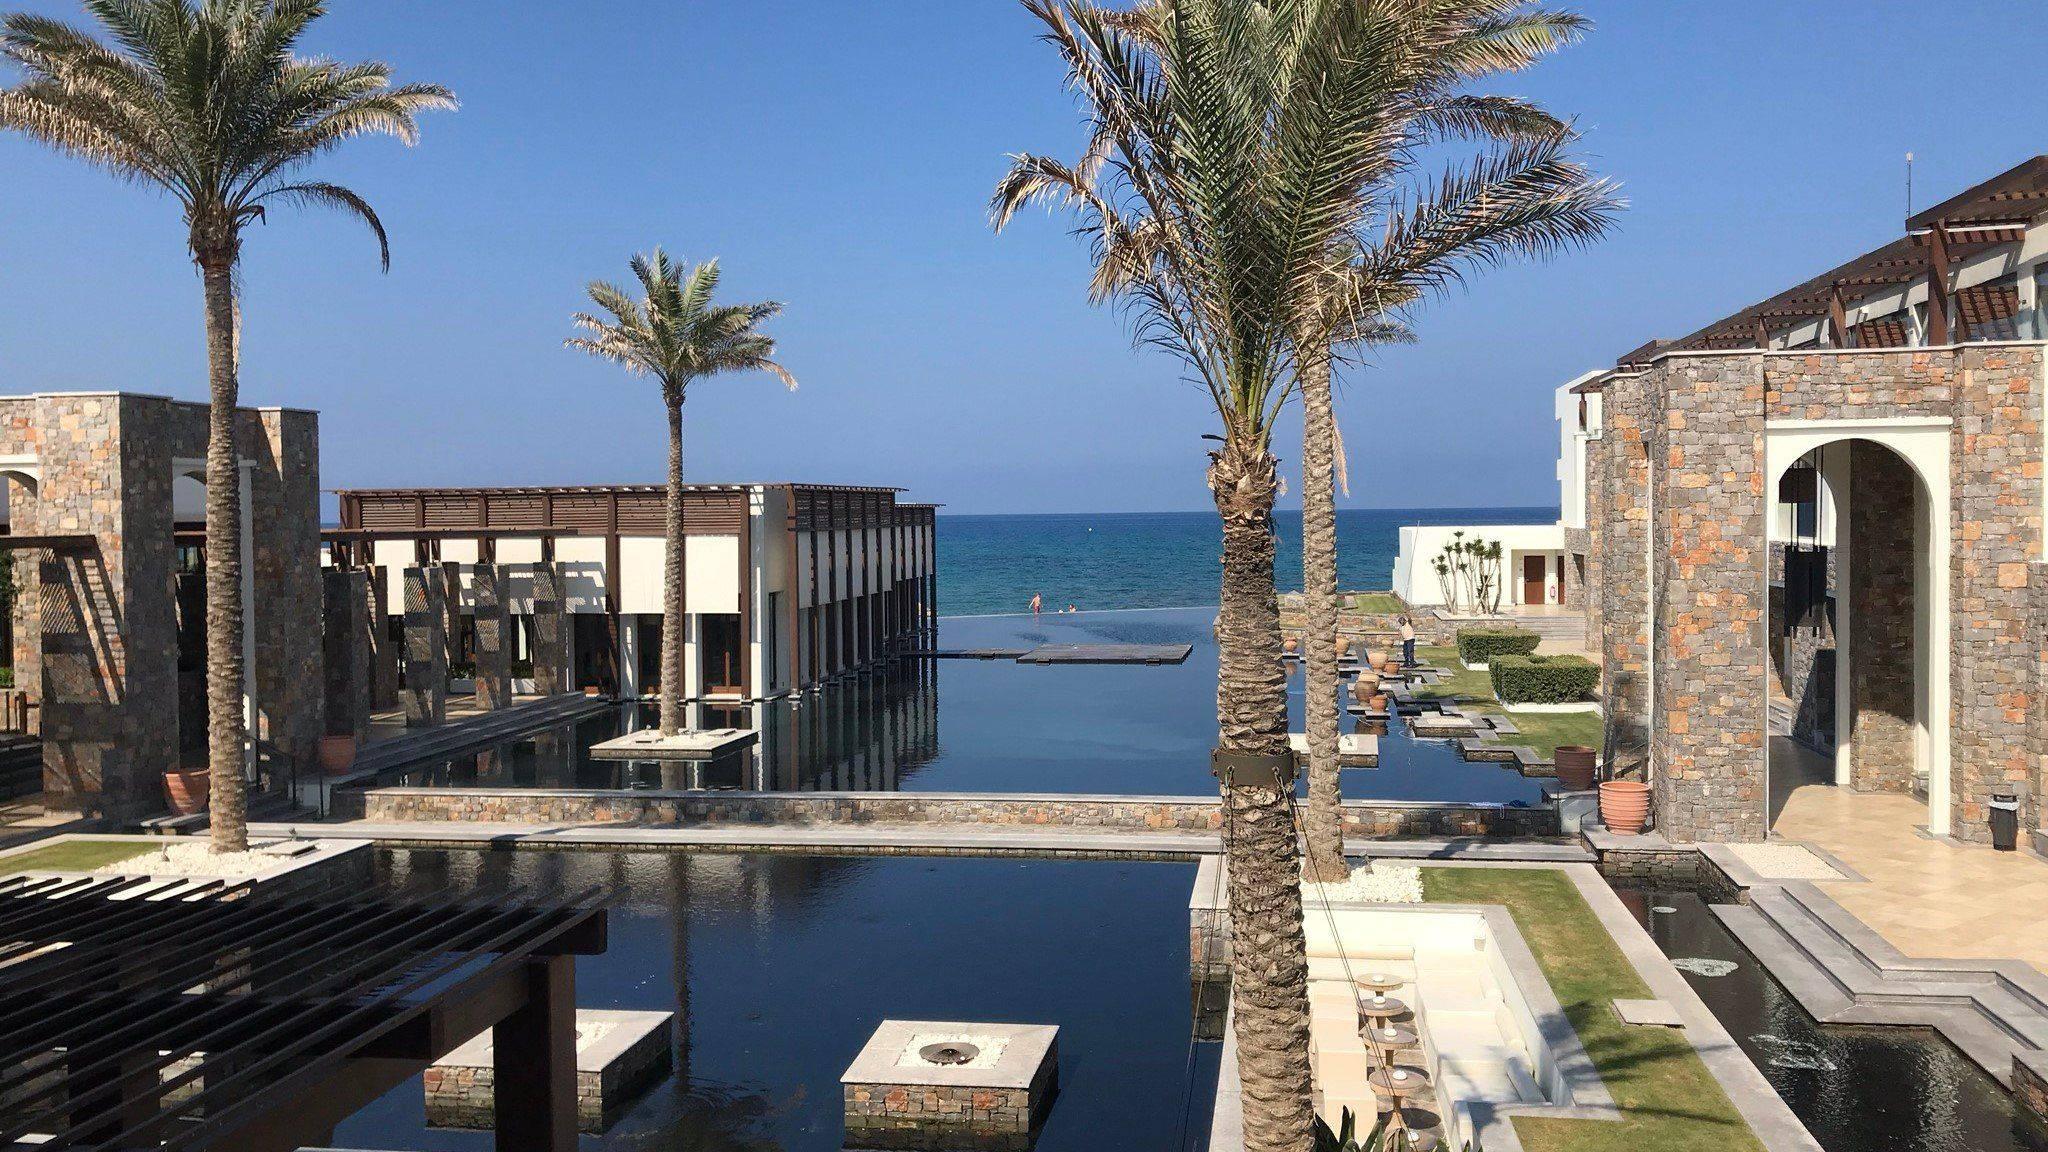 Amirandes Kreta Blick auf Hotel